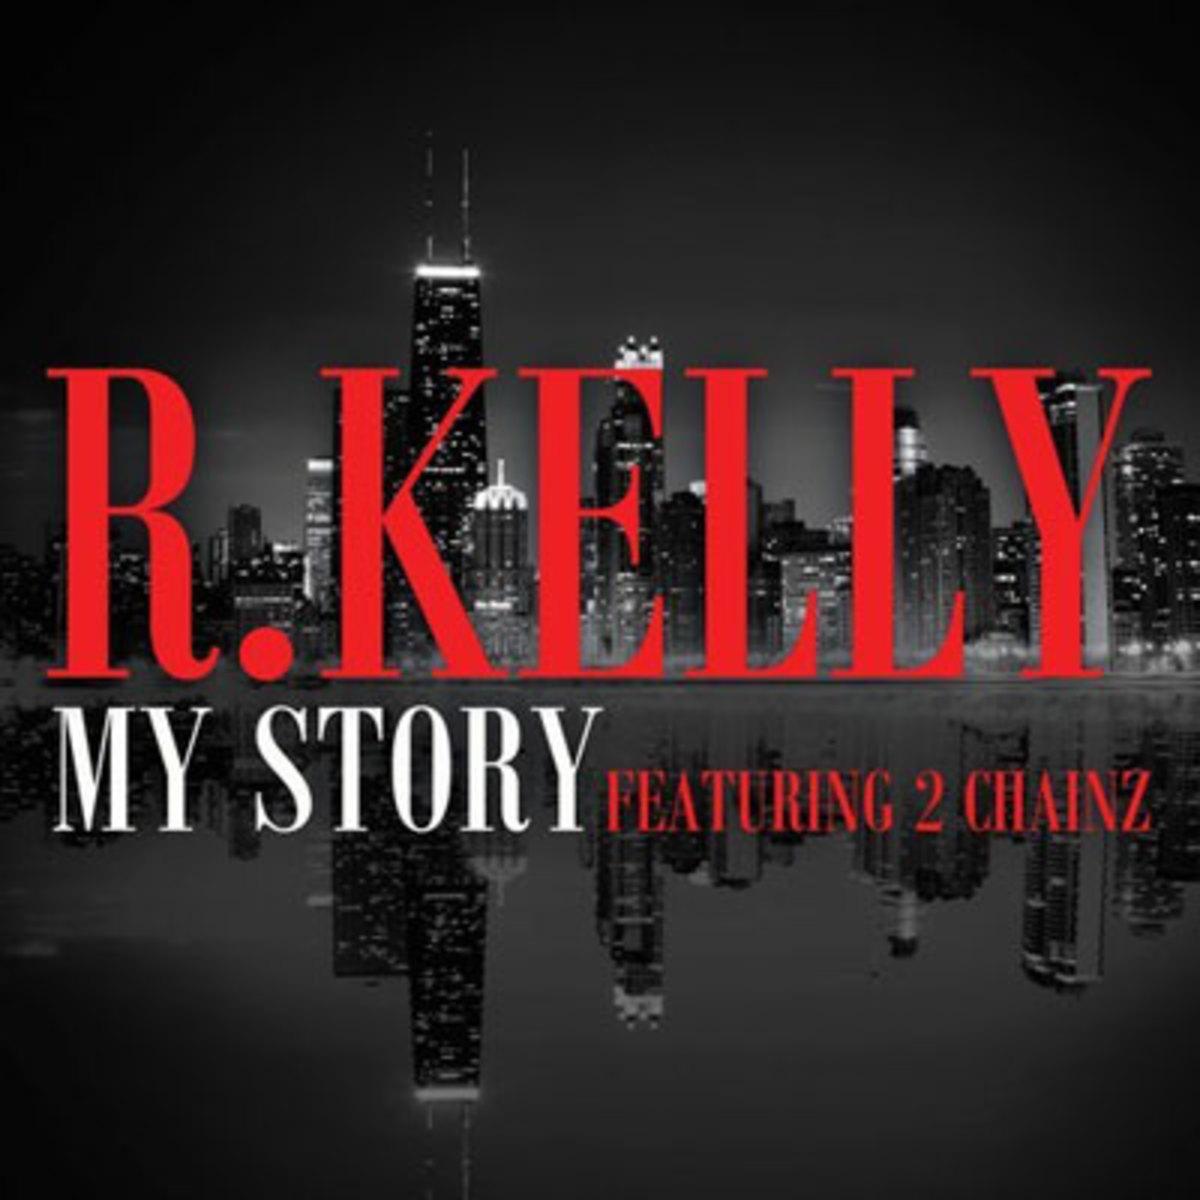 rkelly-mystory.jpg